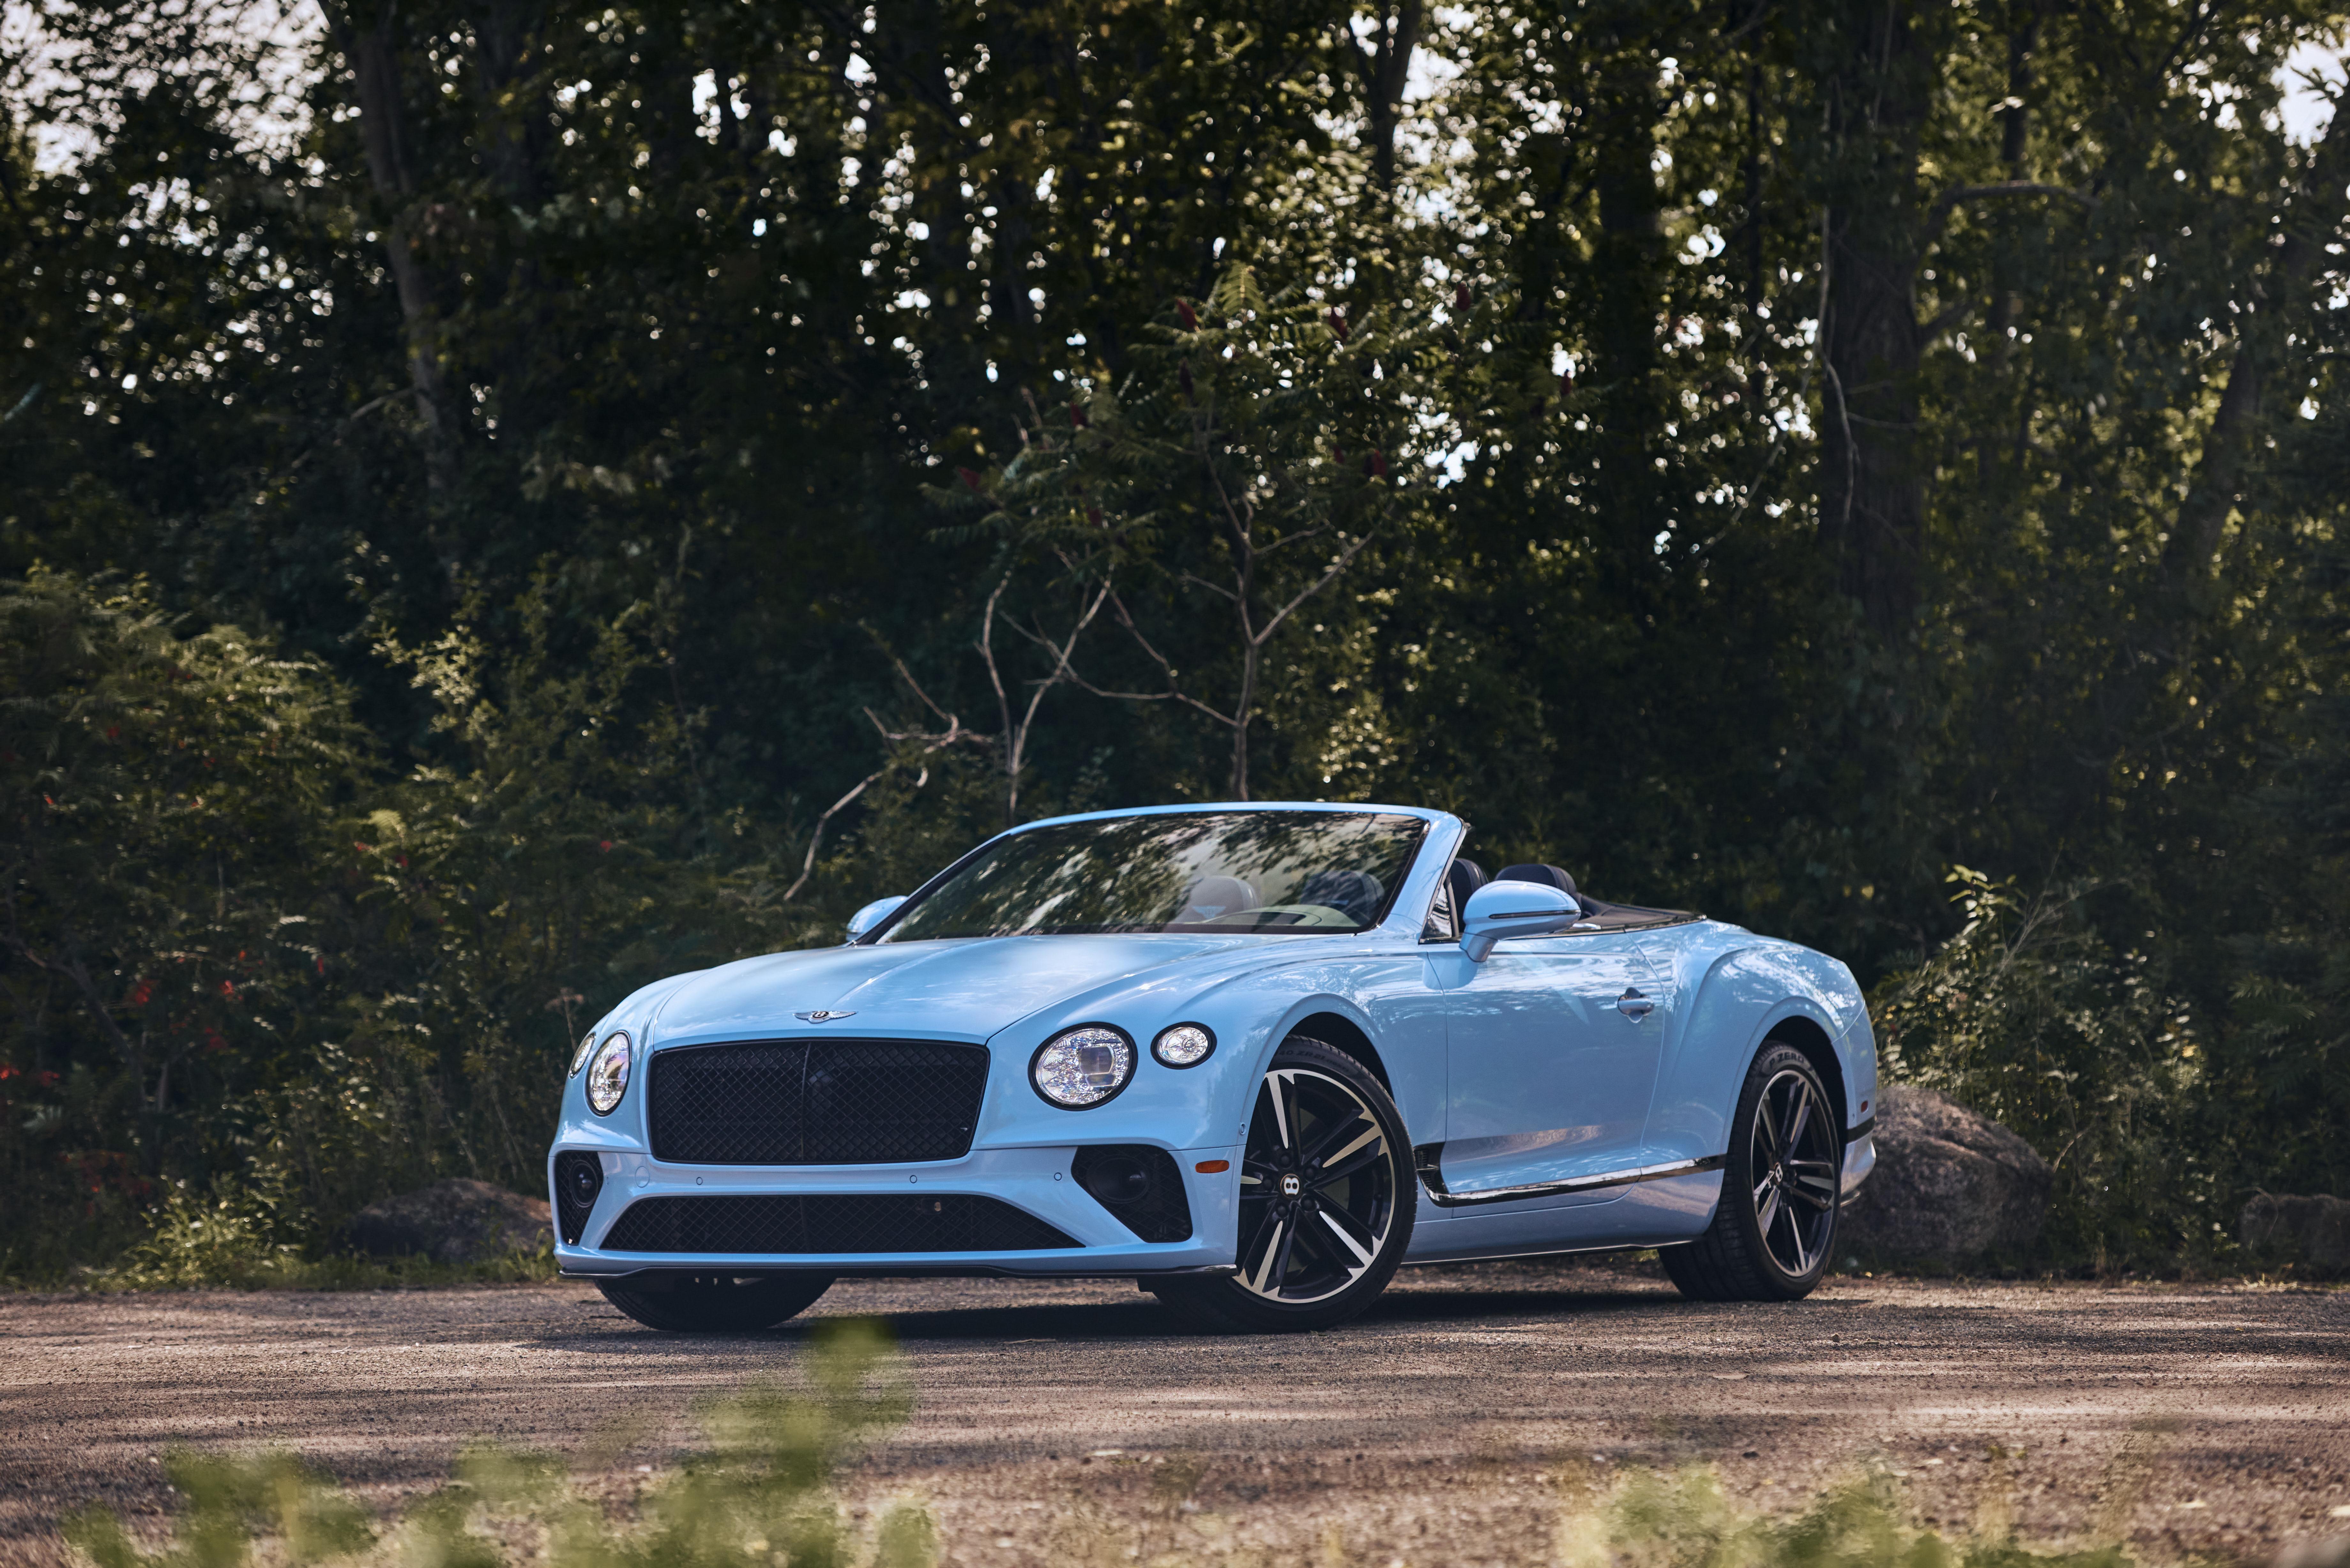 Bentley Continental Gt 4k Wallpaper Convertible 2020 5k 8k Cars 2748